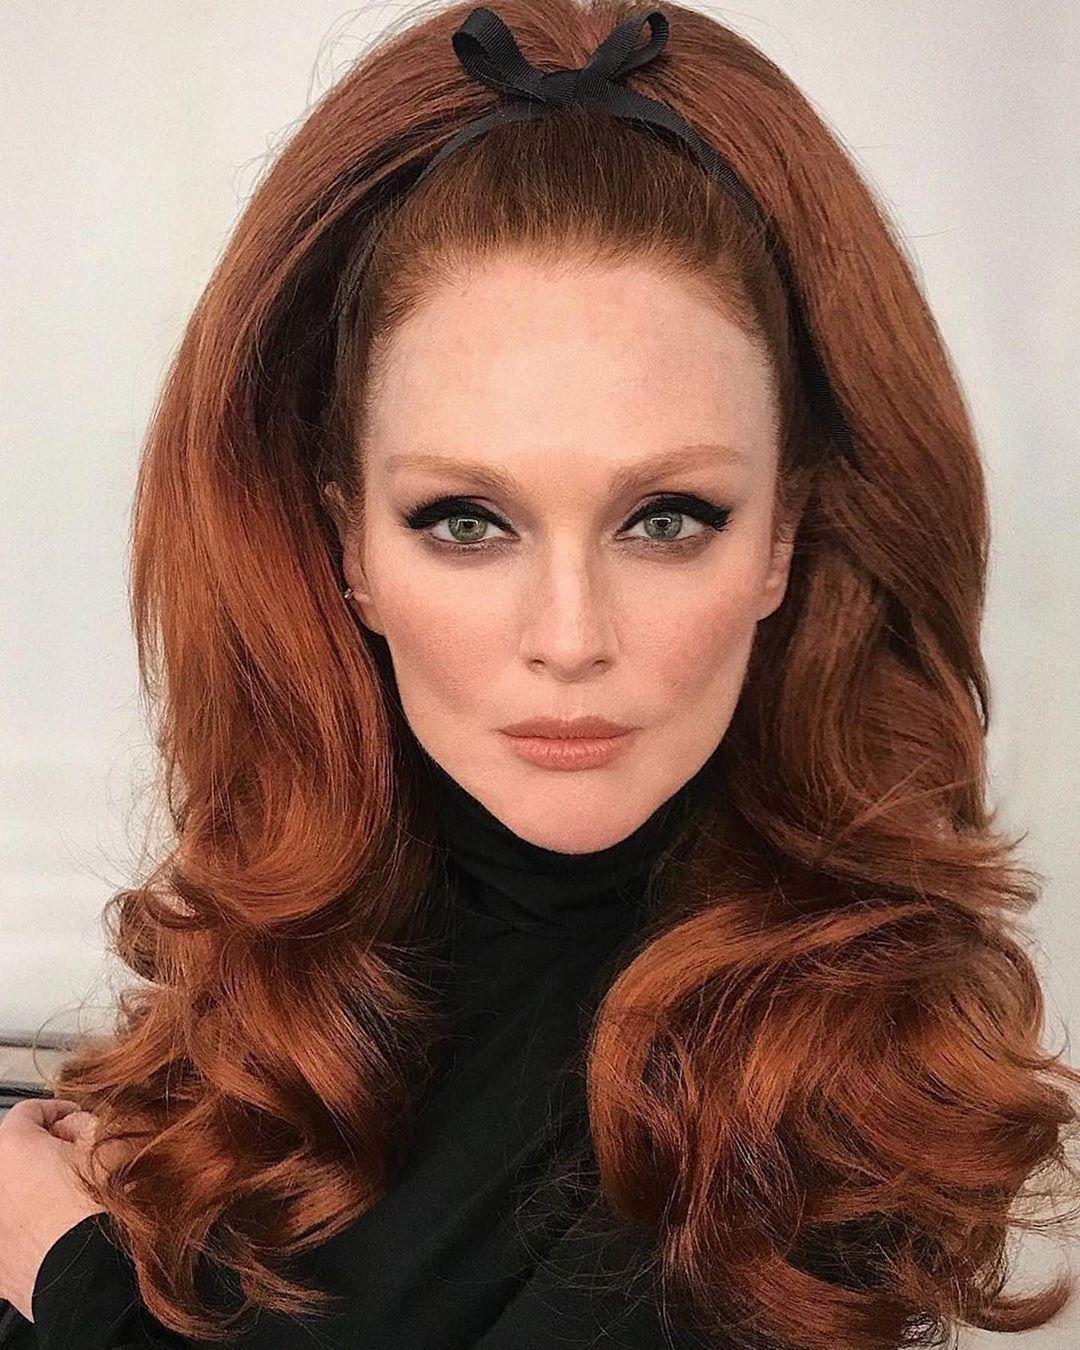 6 578 Curtidas 14 Comentarios Inbeaut Magazine Inbeautmag No Instagram Makeup Hungvanngo Md Juliannemoore Hair Styles Long Hair Styles 1960s Hair